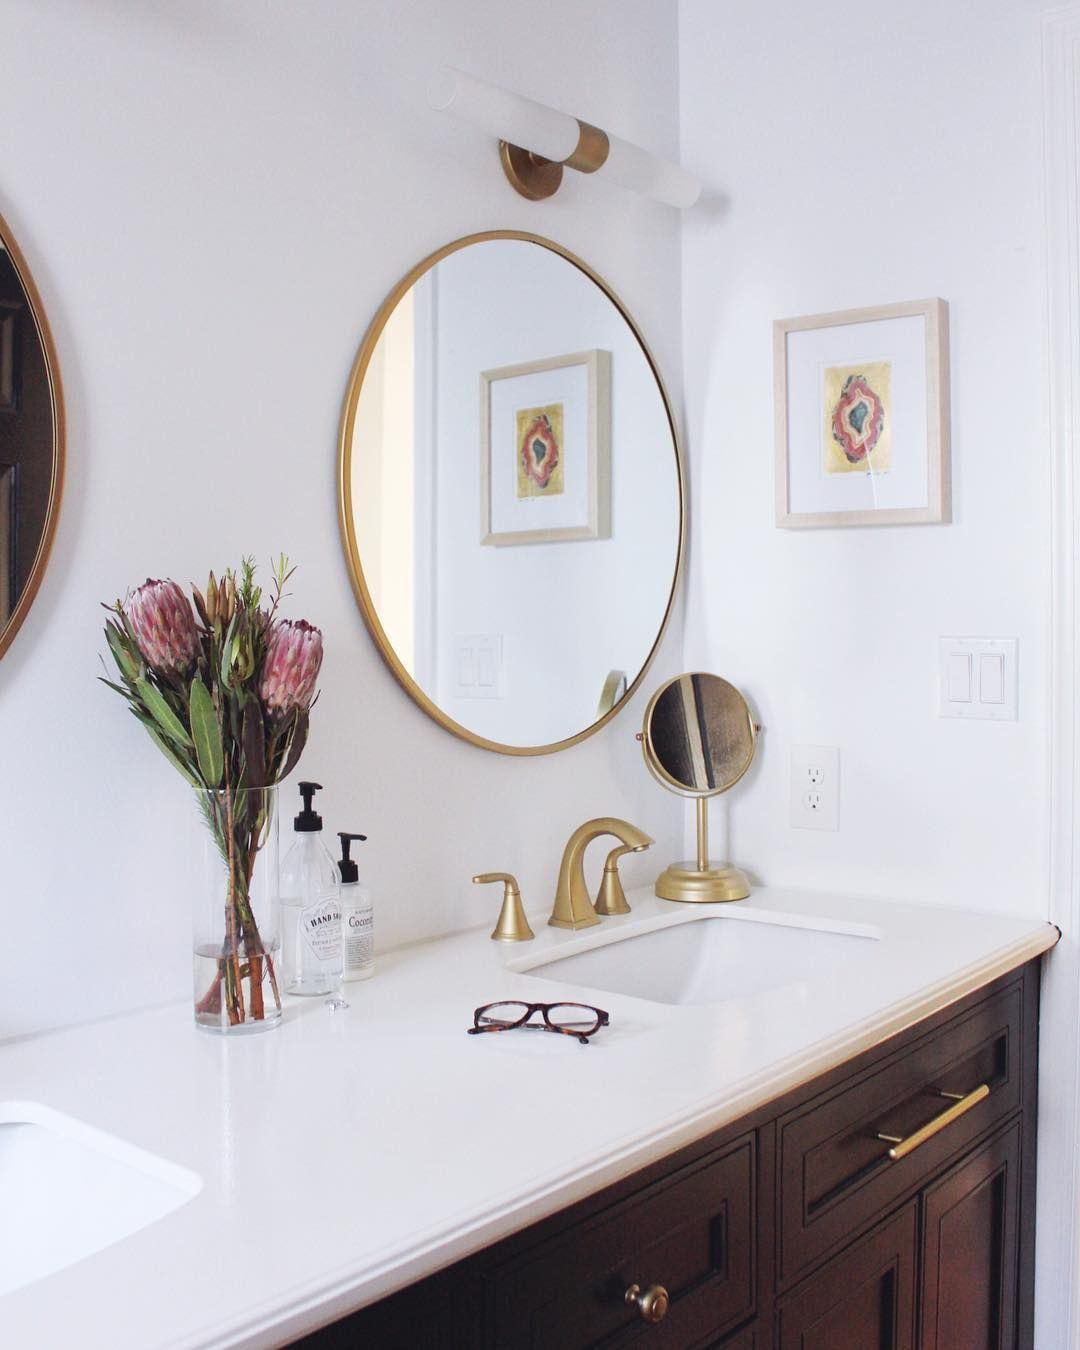 George Kovacs Light Used In Bathroom Of Goldalamode Soften The